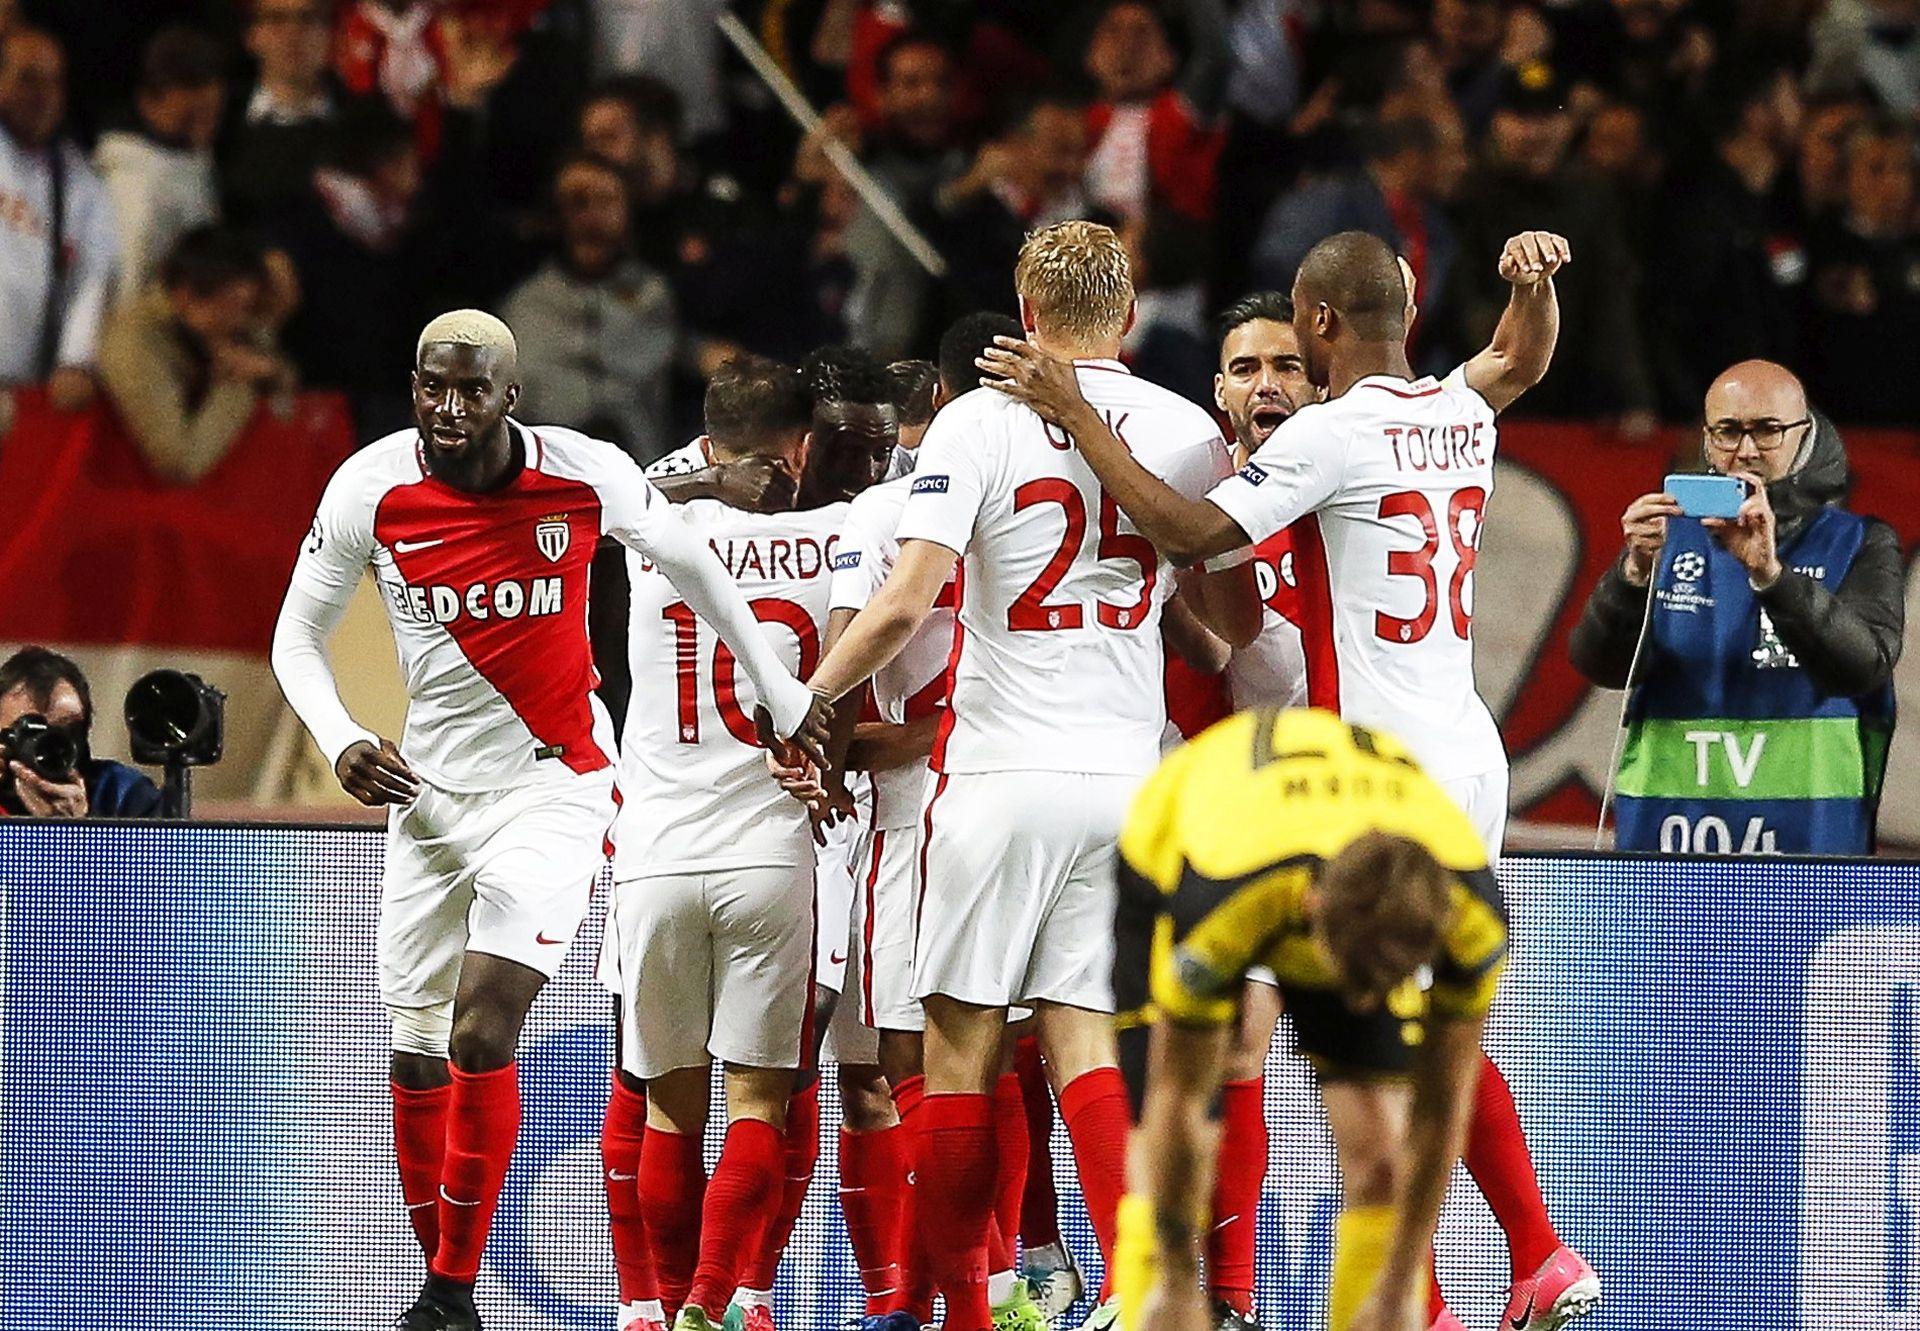 LP Monaco – Borussia Dortmund 3-1